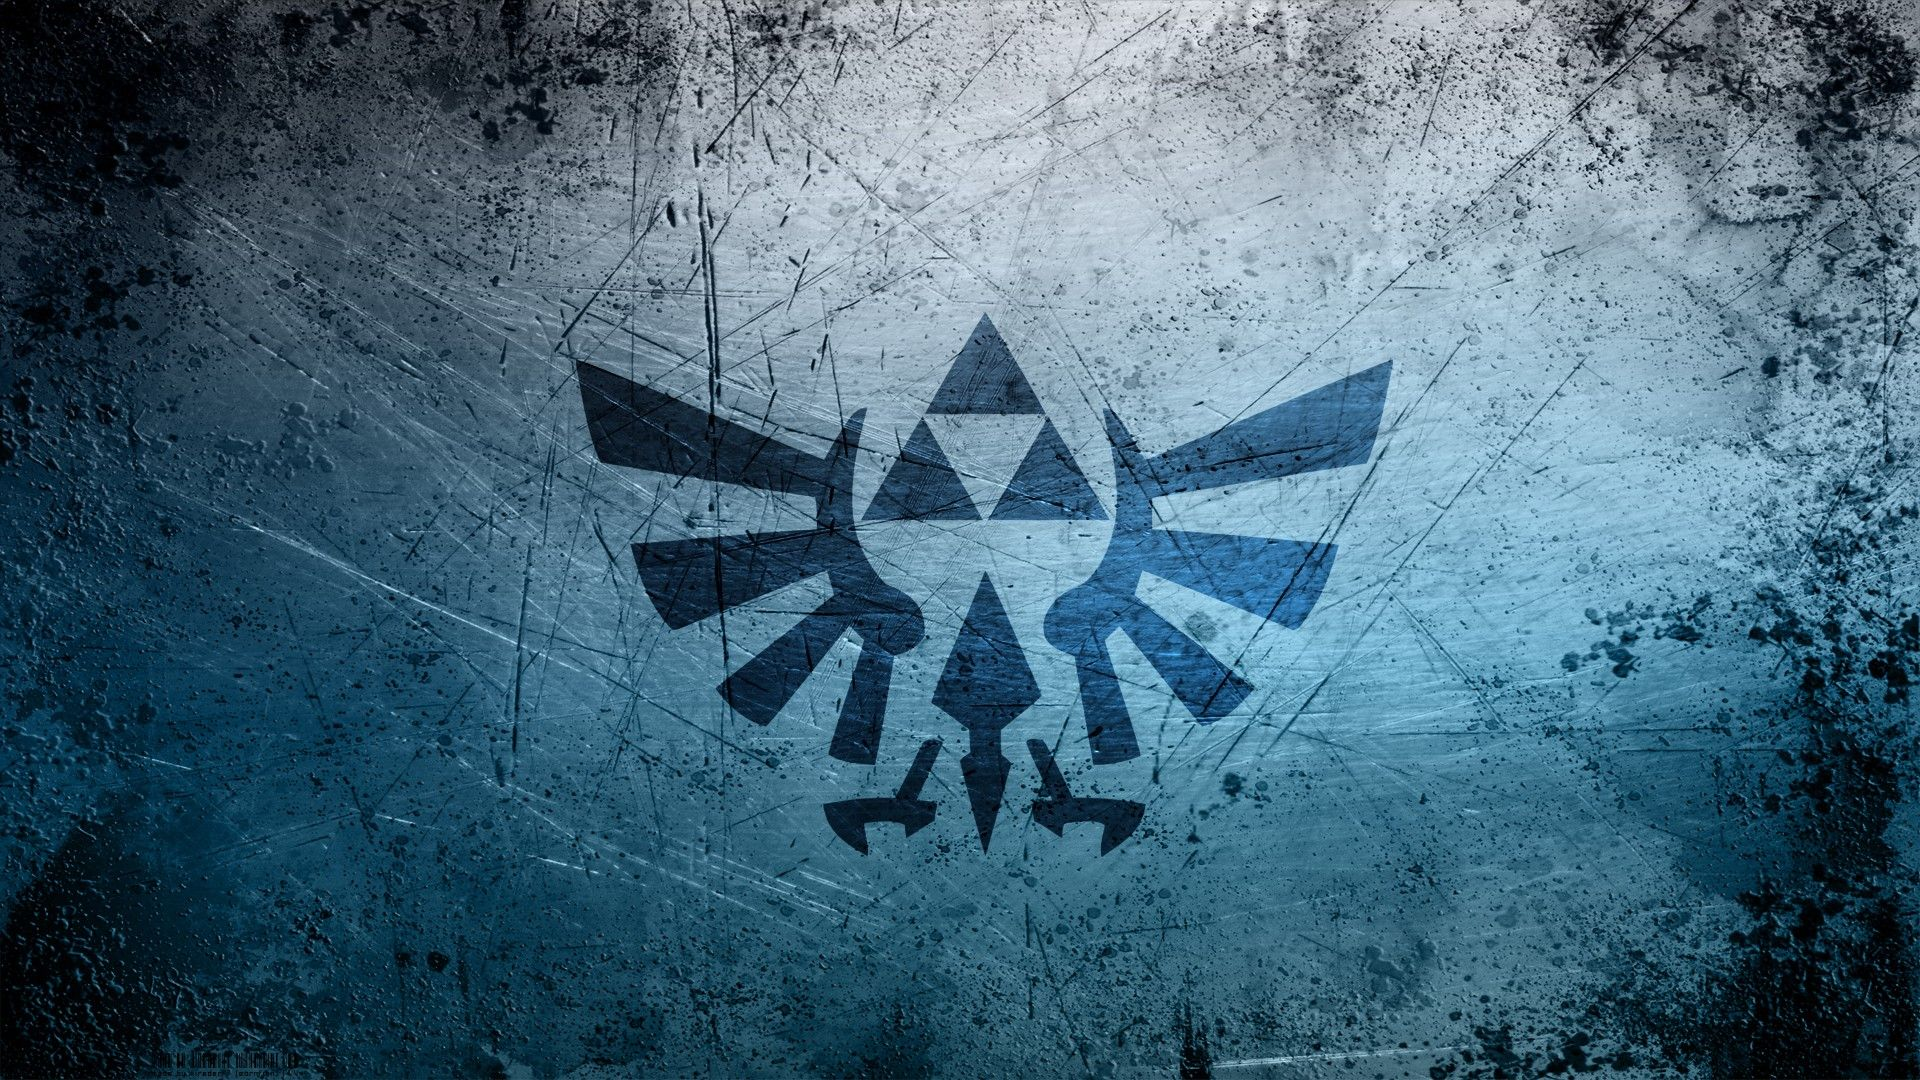 Hyrule Crest The Legend Of Zelda Blue Grunge Logos Wallpaper 845697 Wallbase Cc Gaming Wallpapers Zelda Logo Zelda Hd